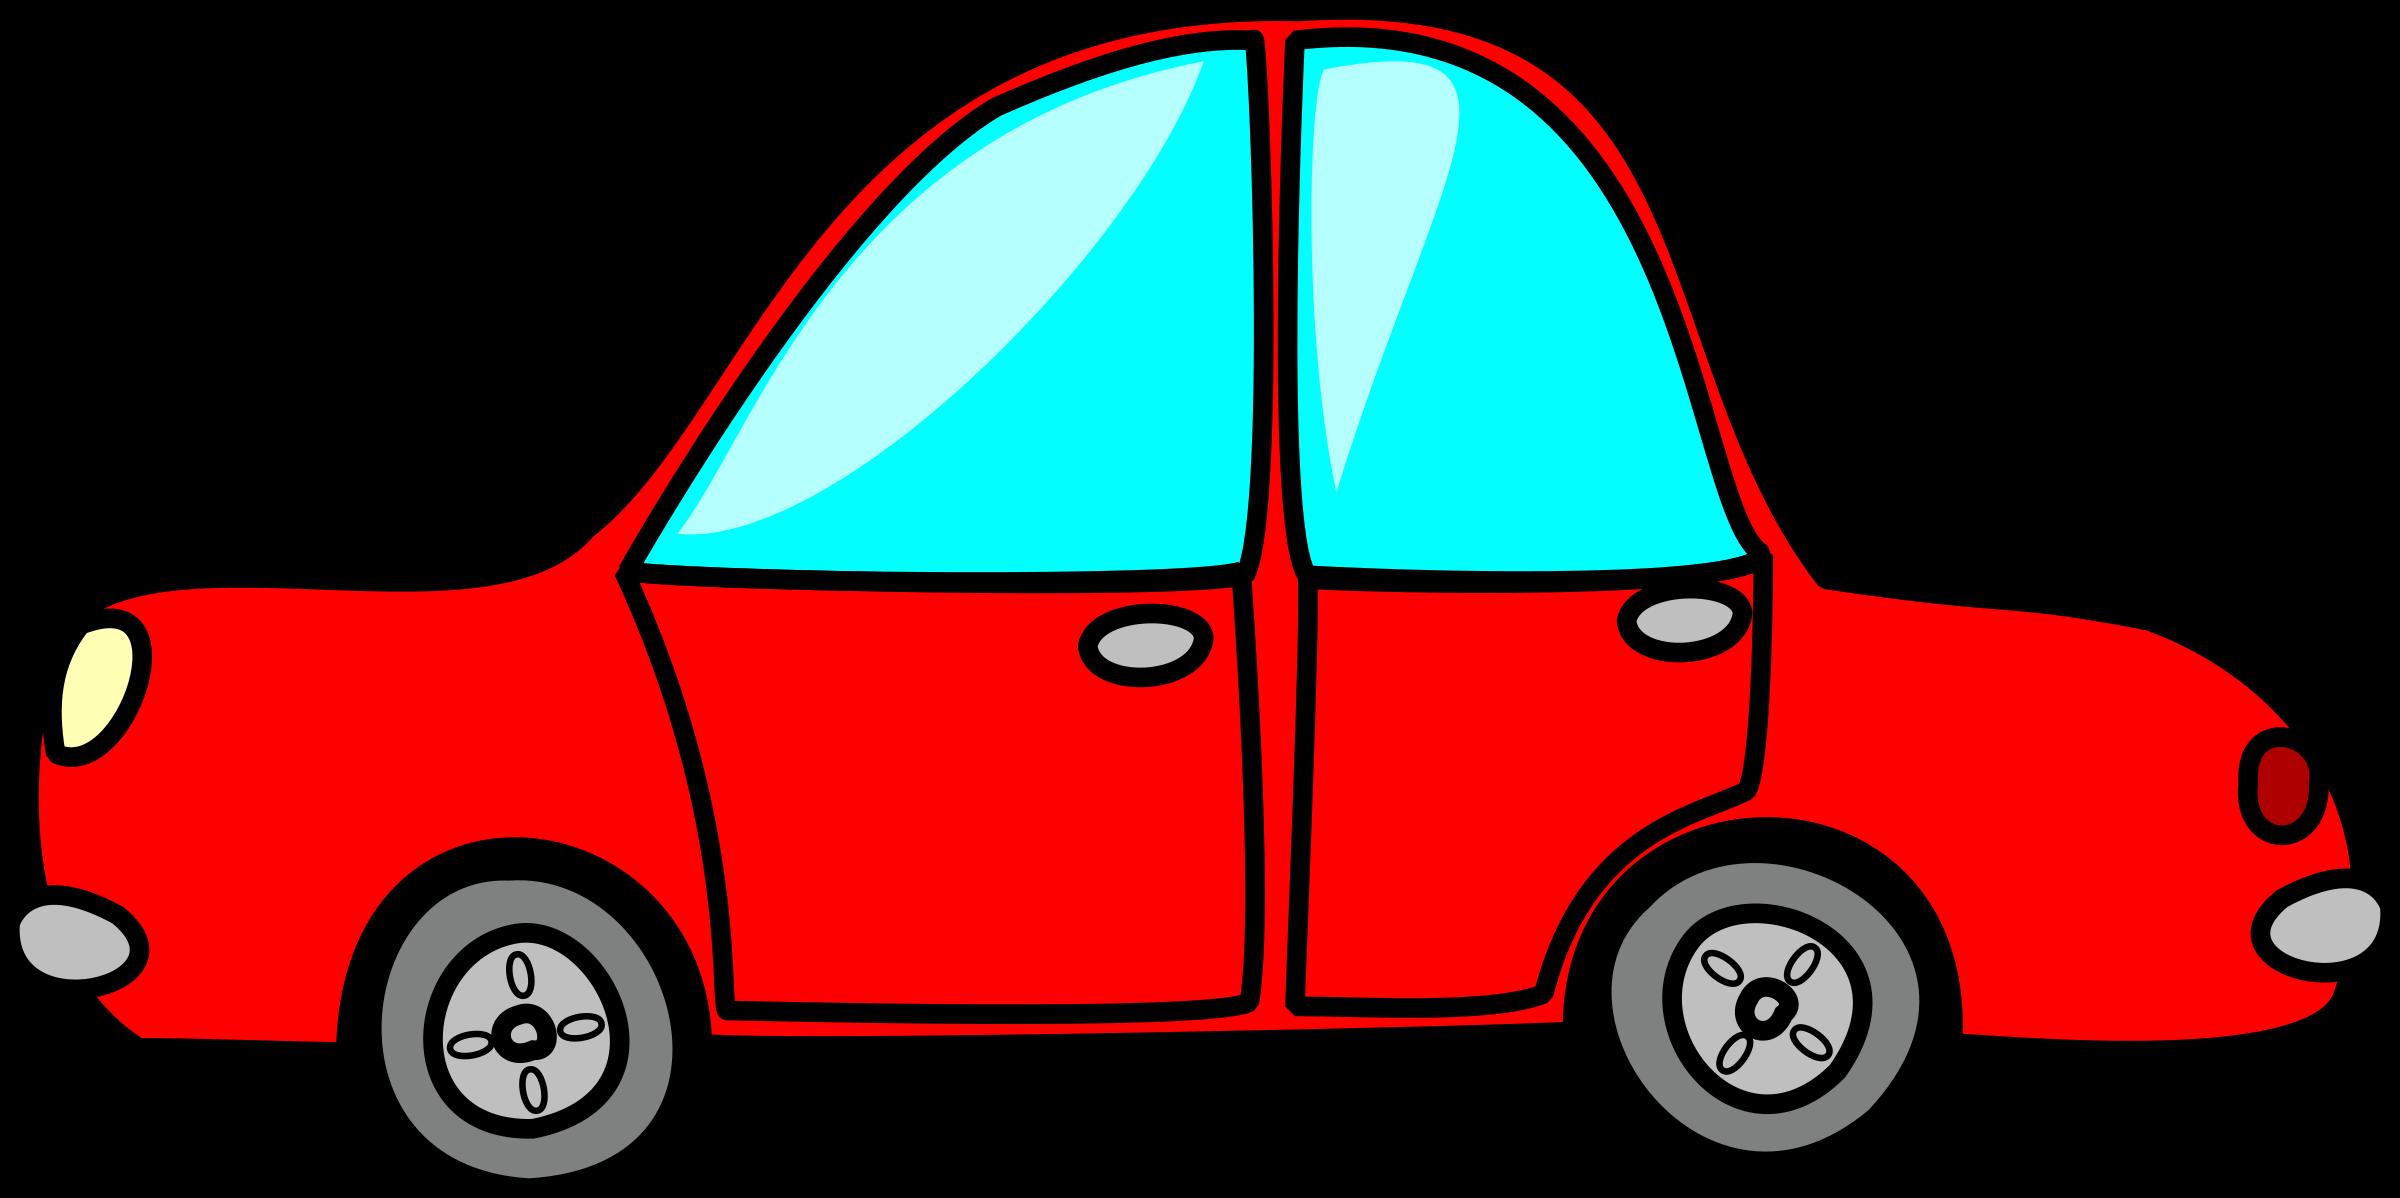 Toy Car PNG Free - 153064